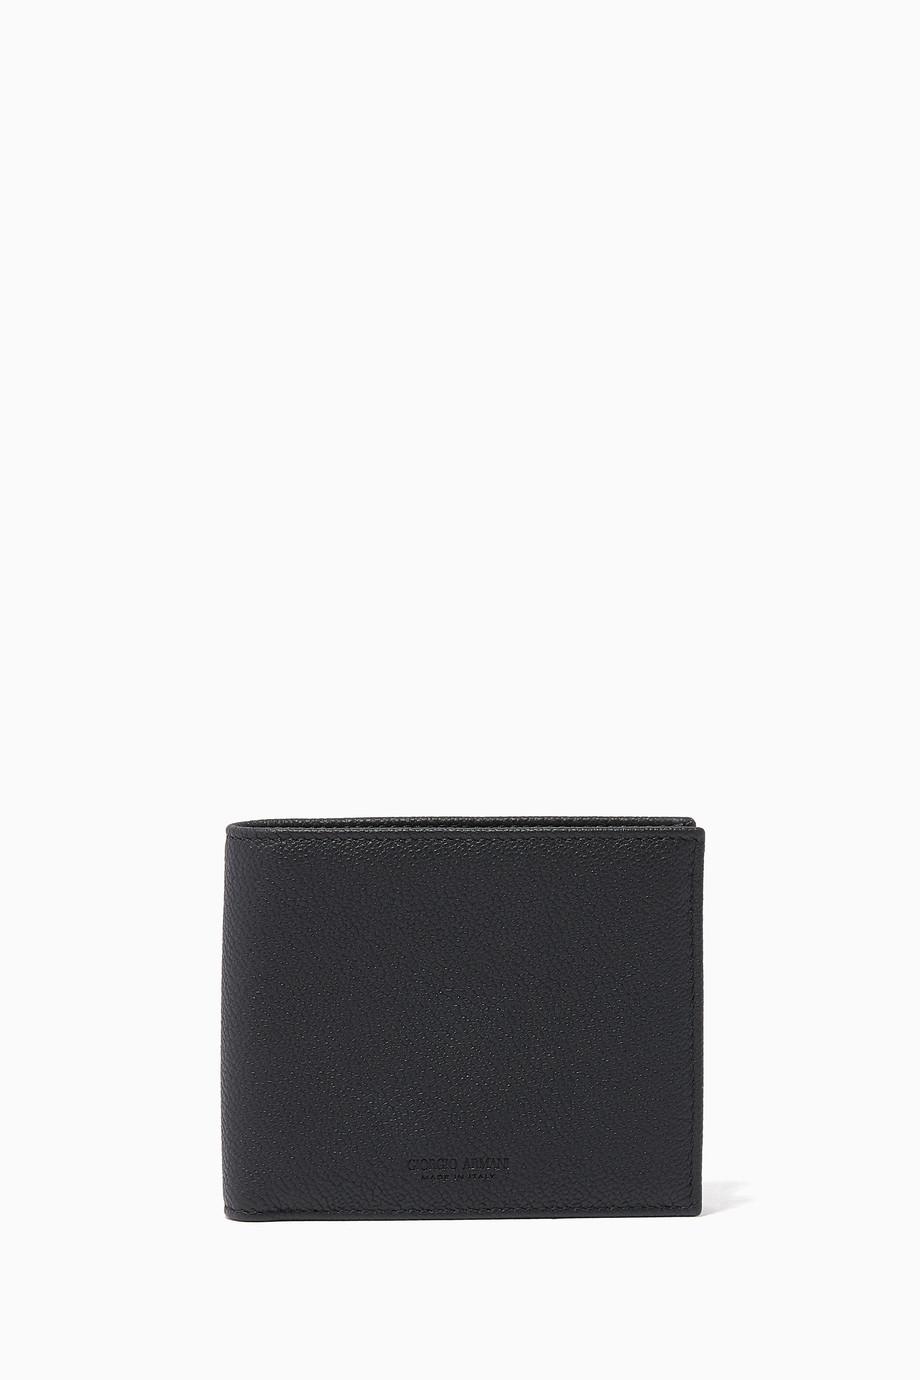 0194f34ce5 Shop Armani Beauty Black Black Leather Wallet for Men | Ounass